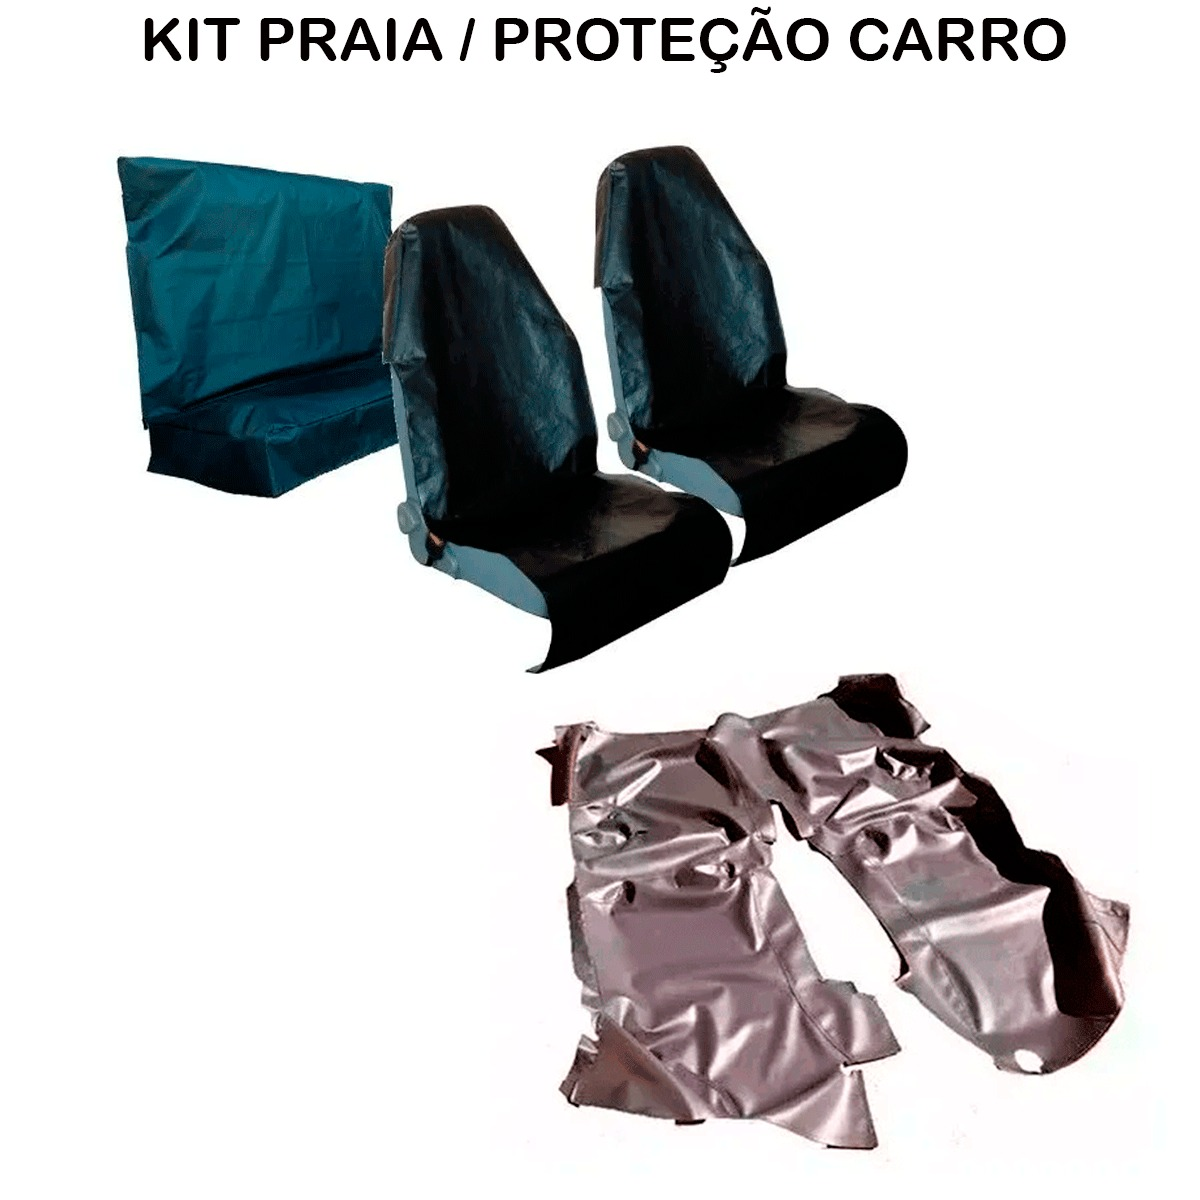 Tapete Em Vinil Volkswagen Golf Sportline + Capa Banco Protecao Banco Areia Suor Academia